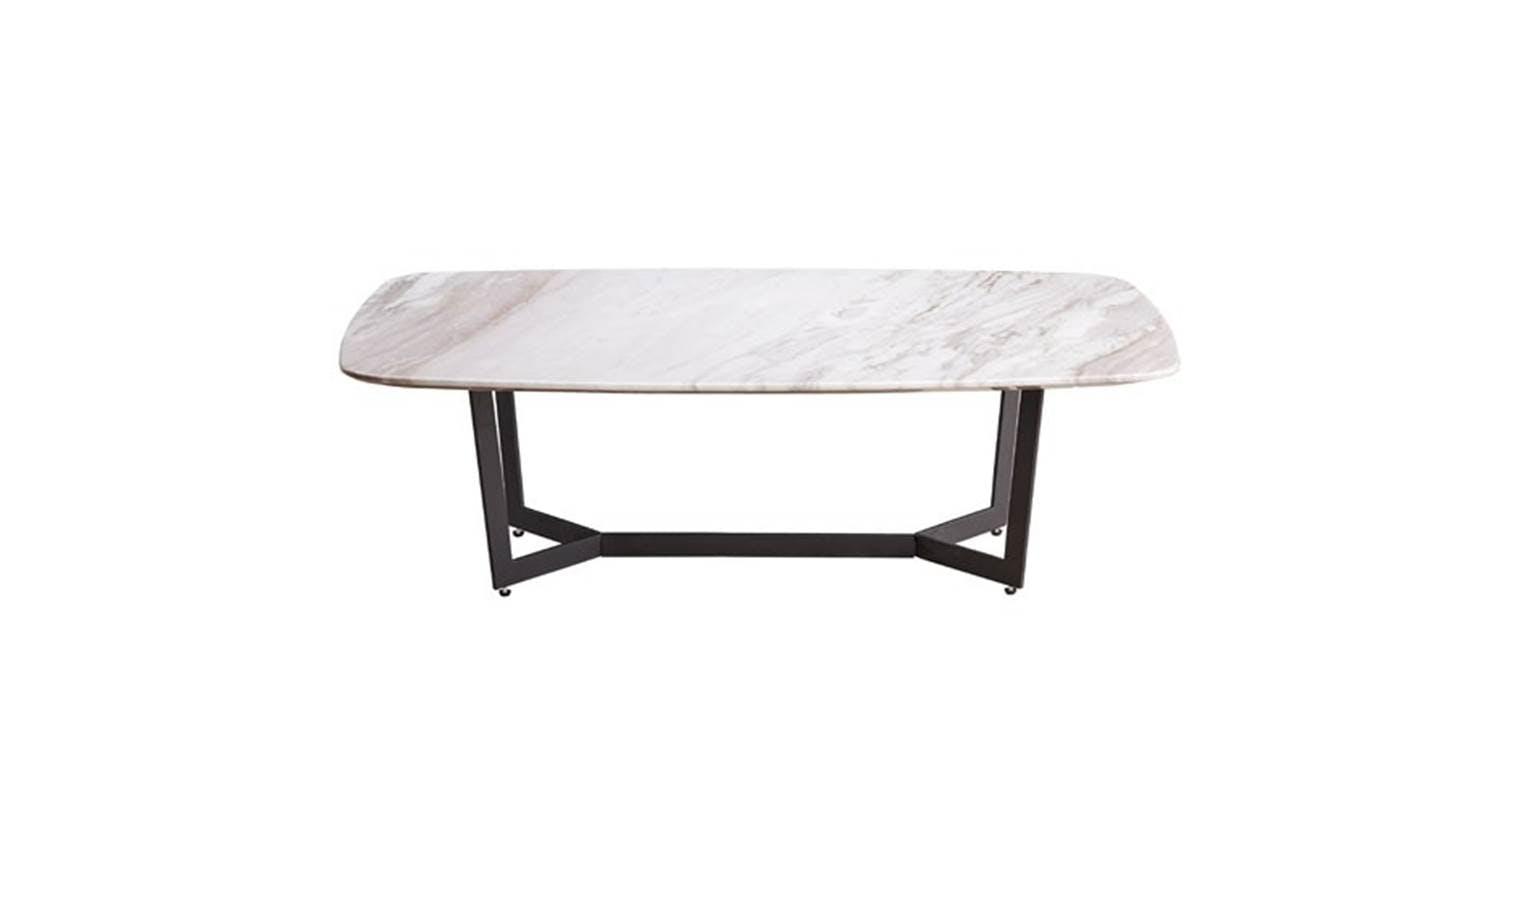 Canopy Coffee Table Harvey Norman Malaysia